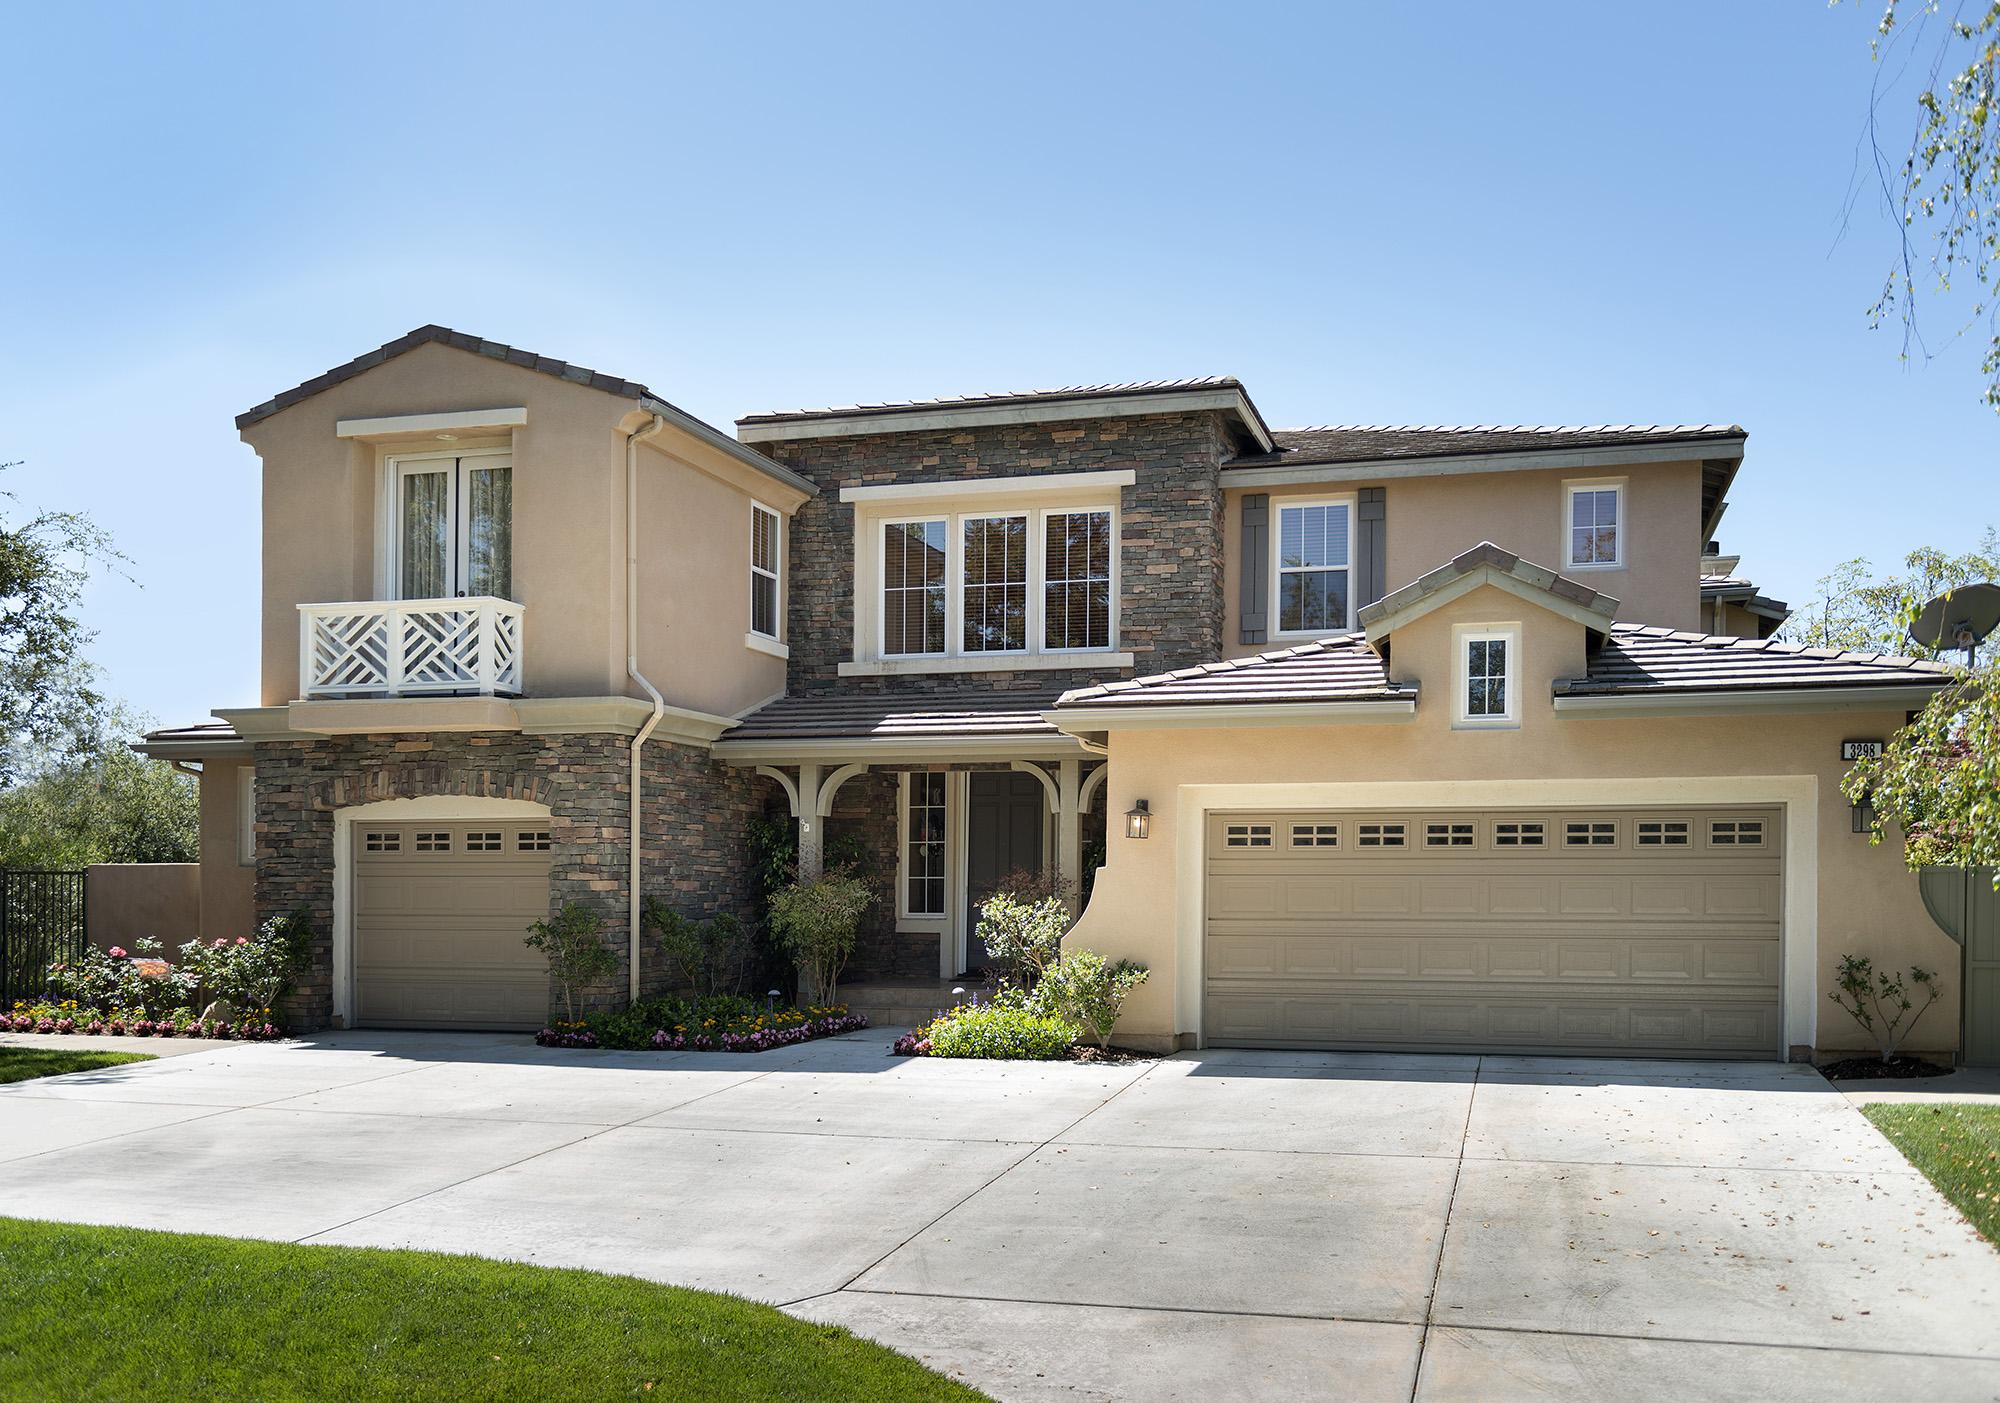 3298 Windridge Ave Thousand Oaks